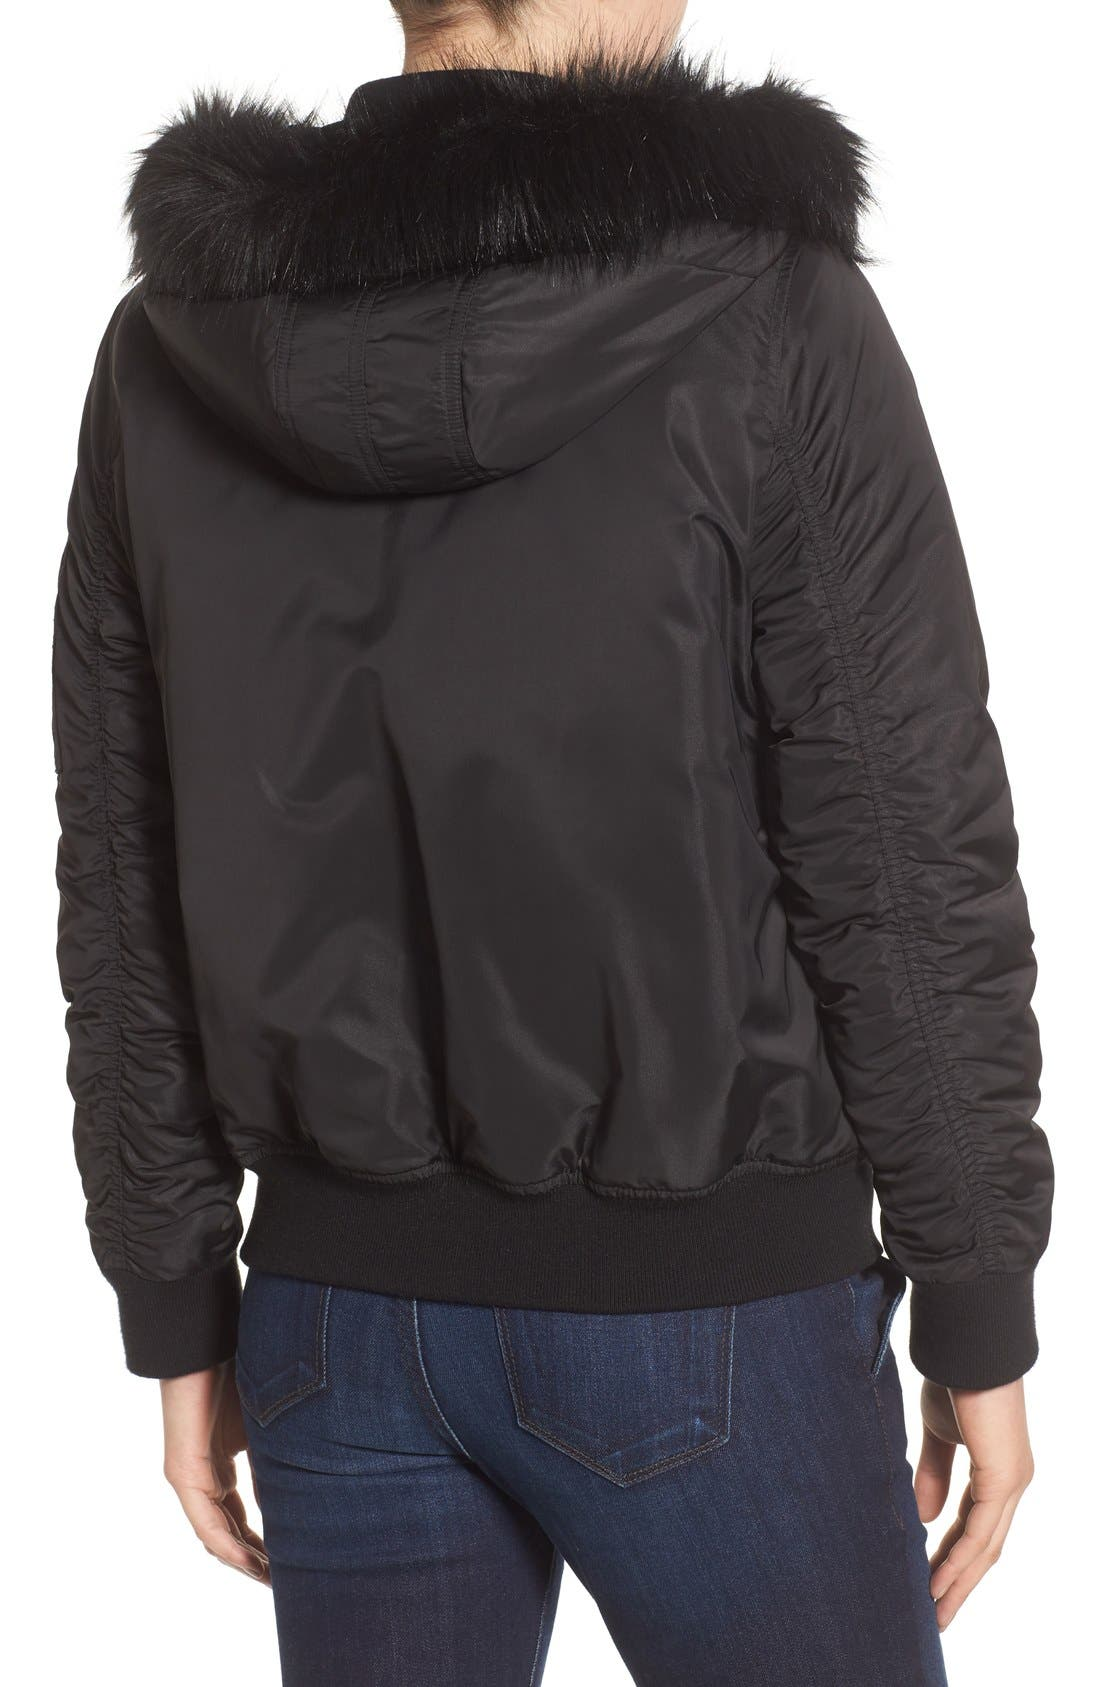 'Varsity' Hooded Bomber Jacket with Faux Fur Trim,                             Alternate thumbnail 2, color,                             Black